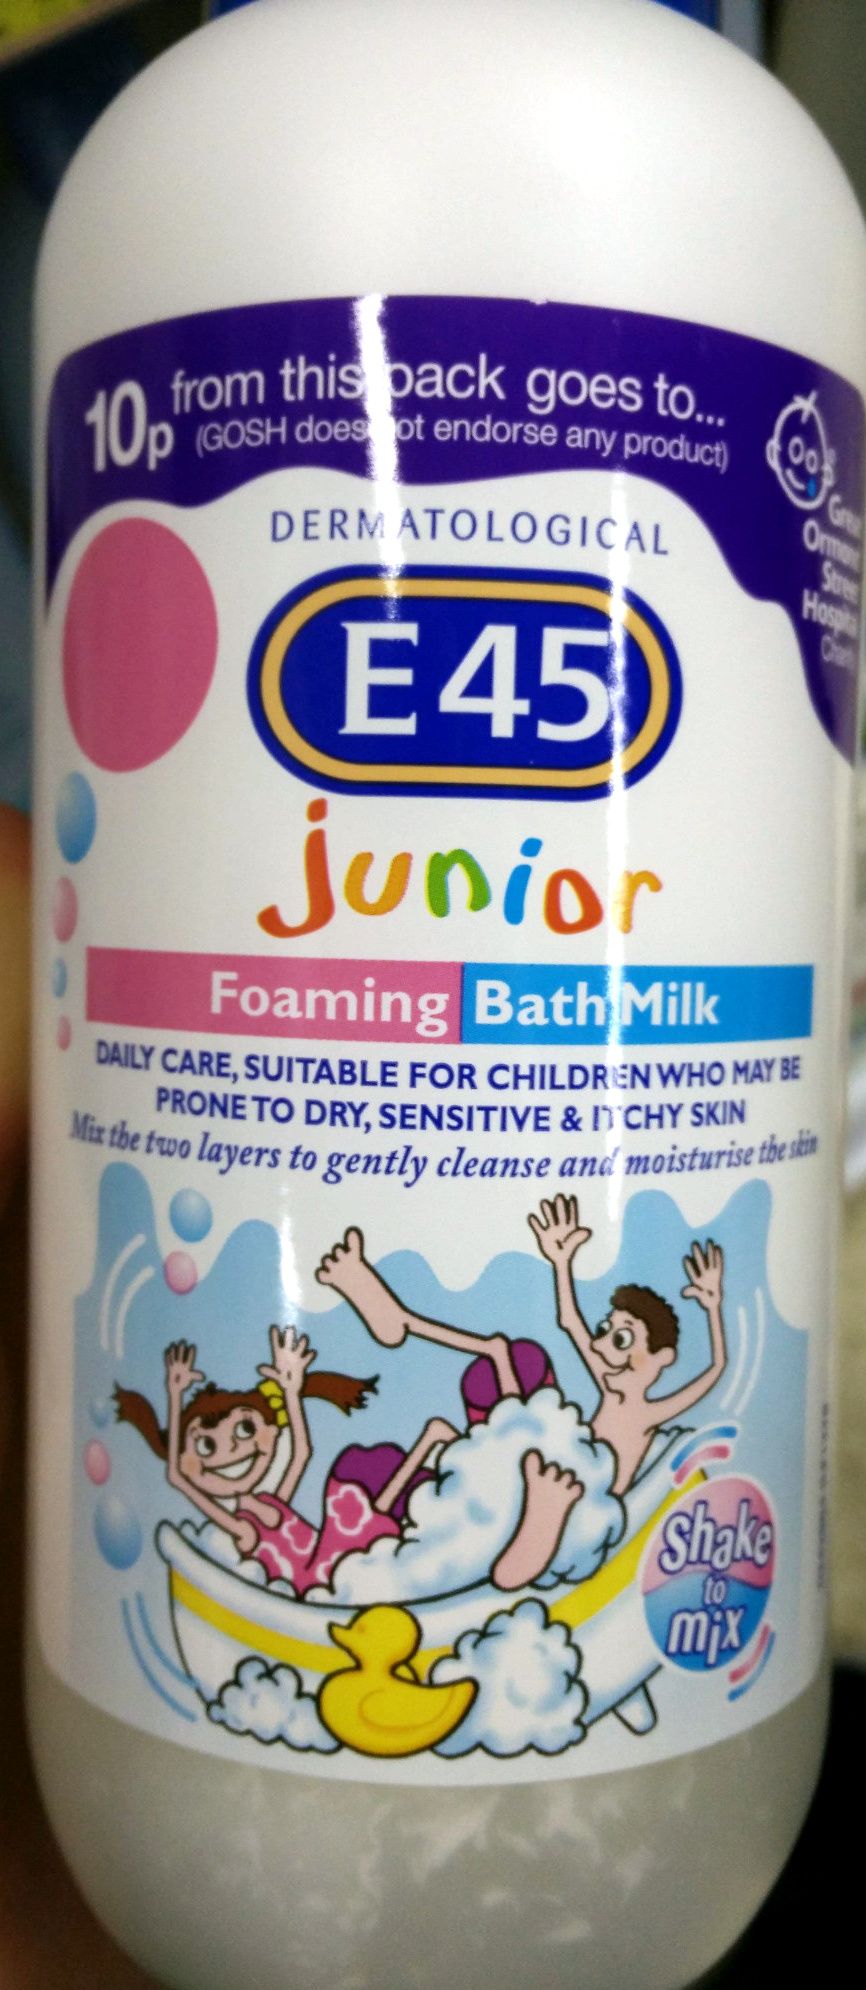 Junior Foaming Bath Milk - Product